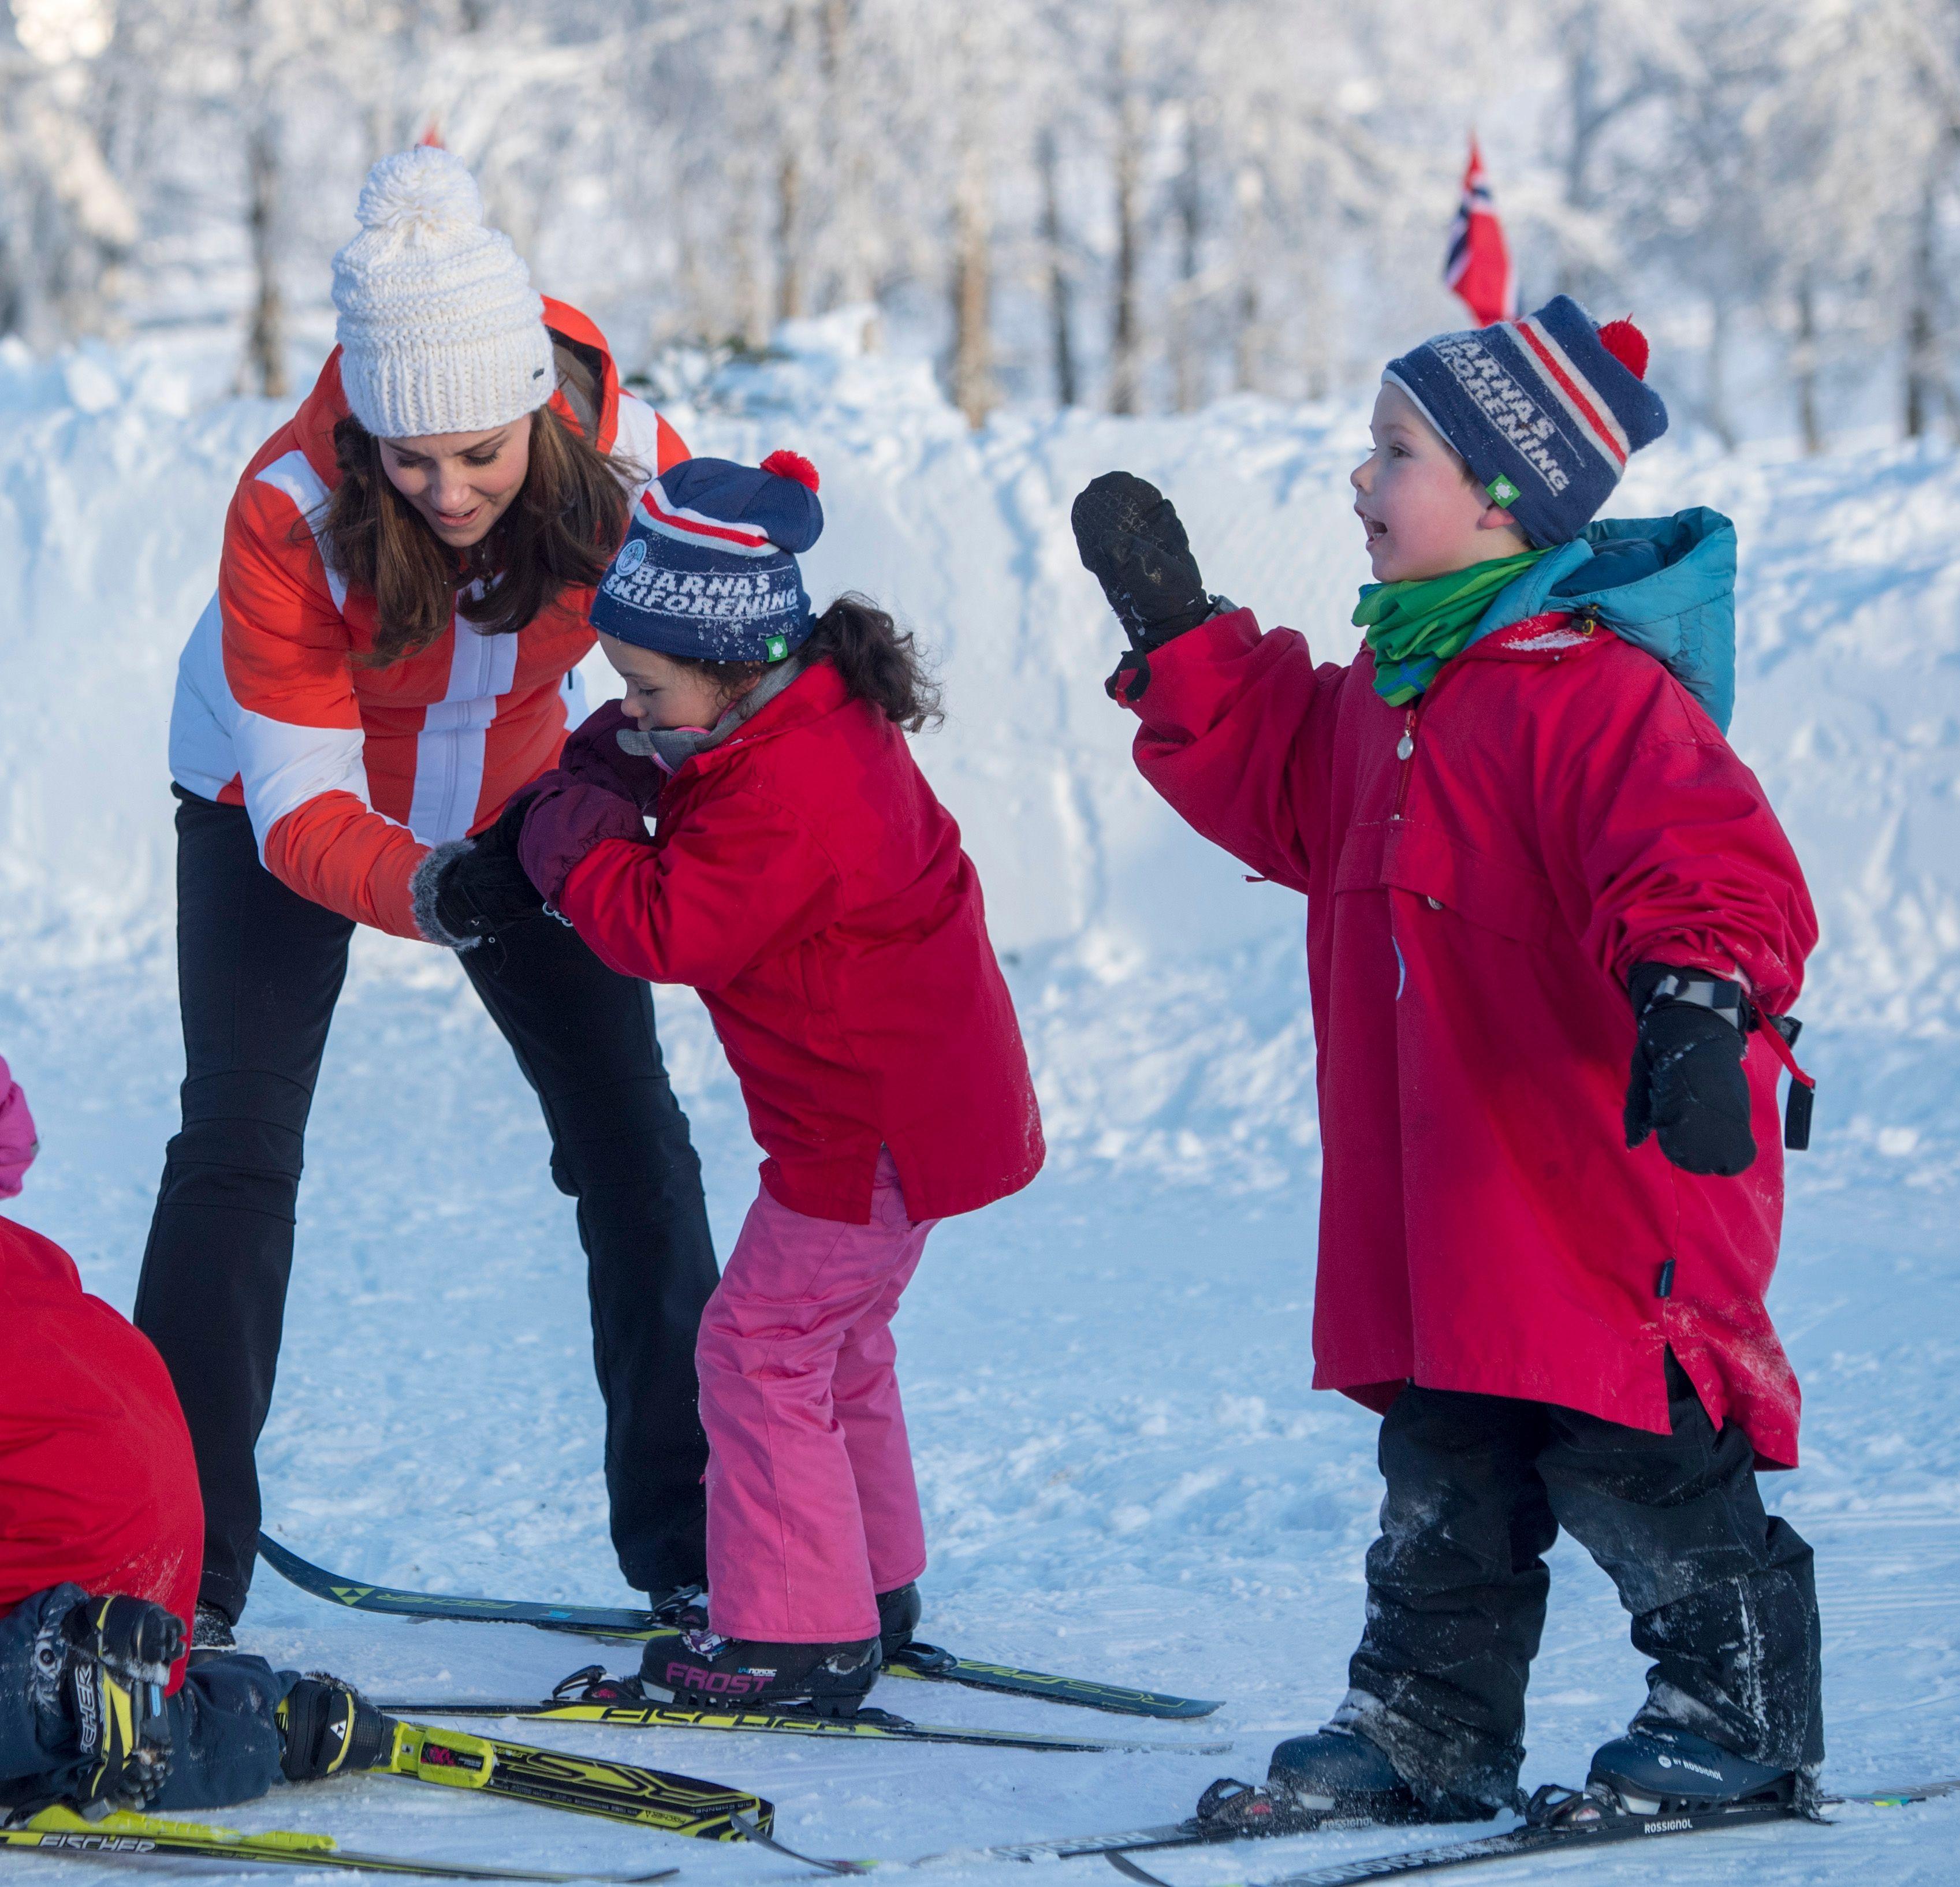 quand Kate Middleton, enceinte, se la joue monitrice de ski !